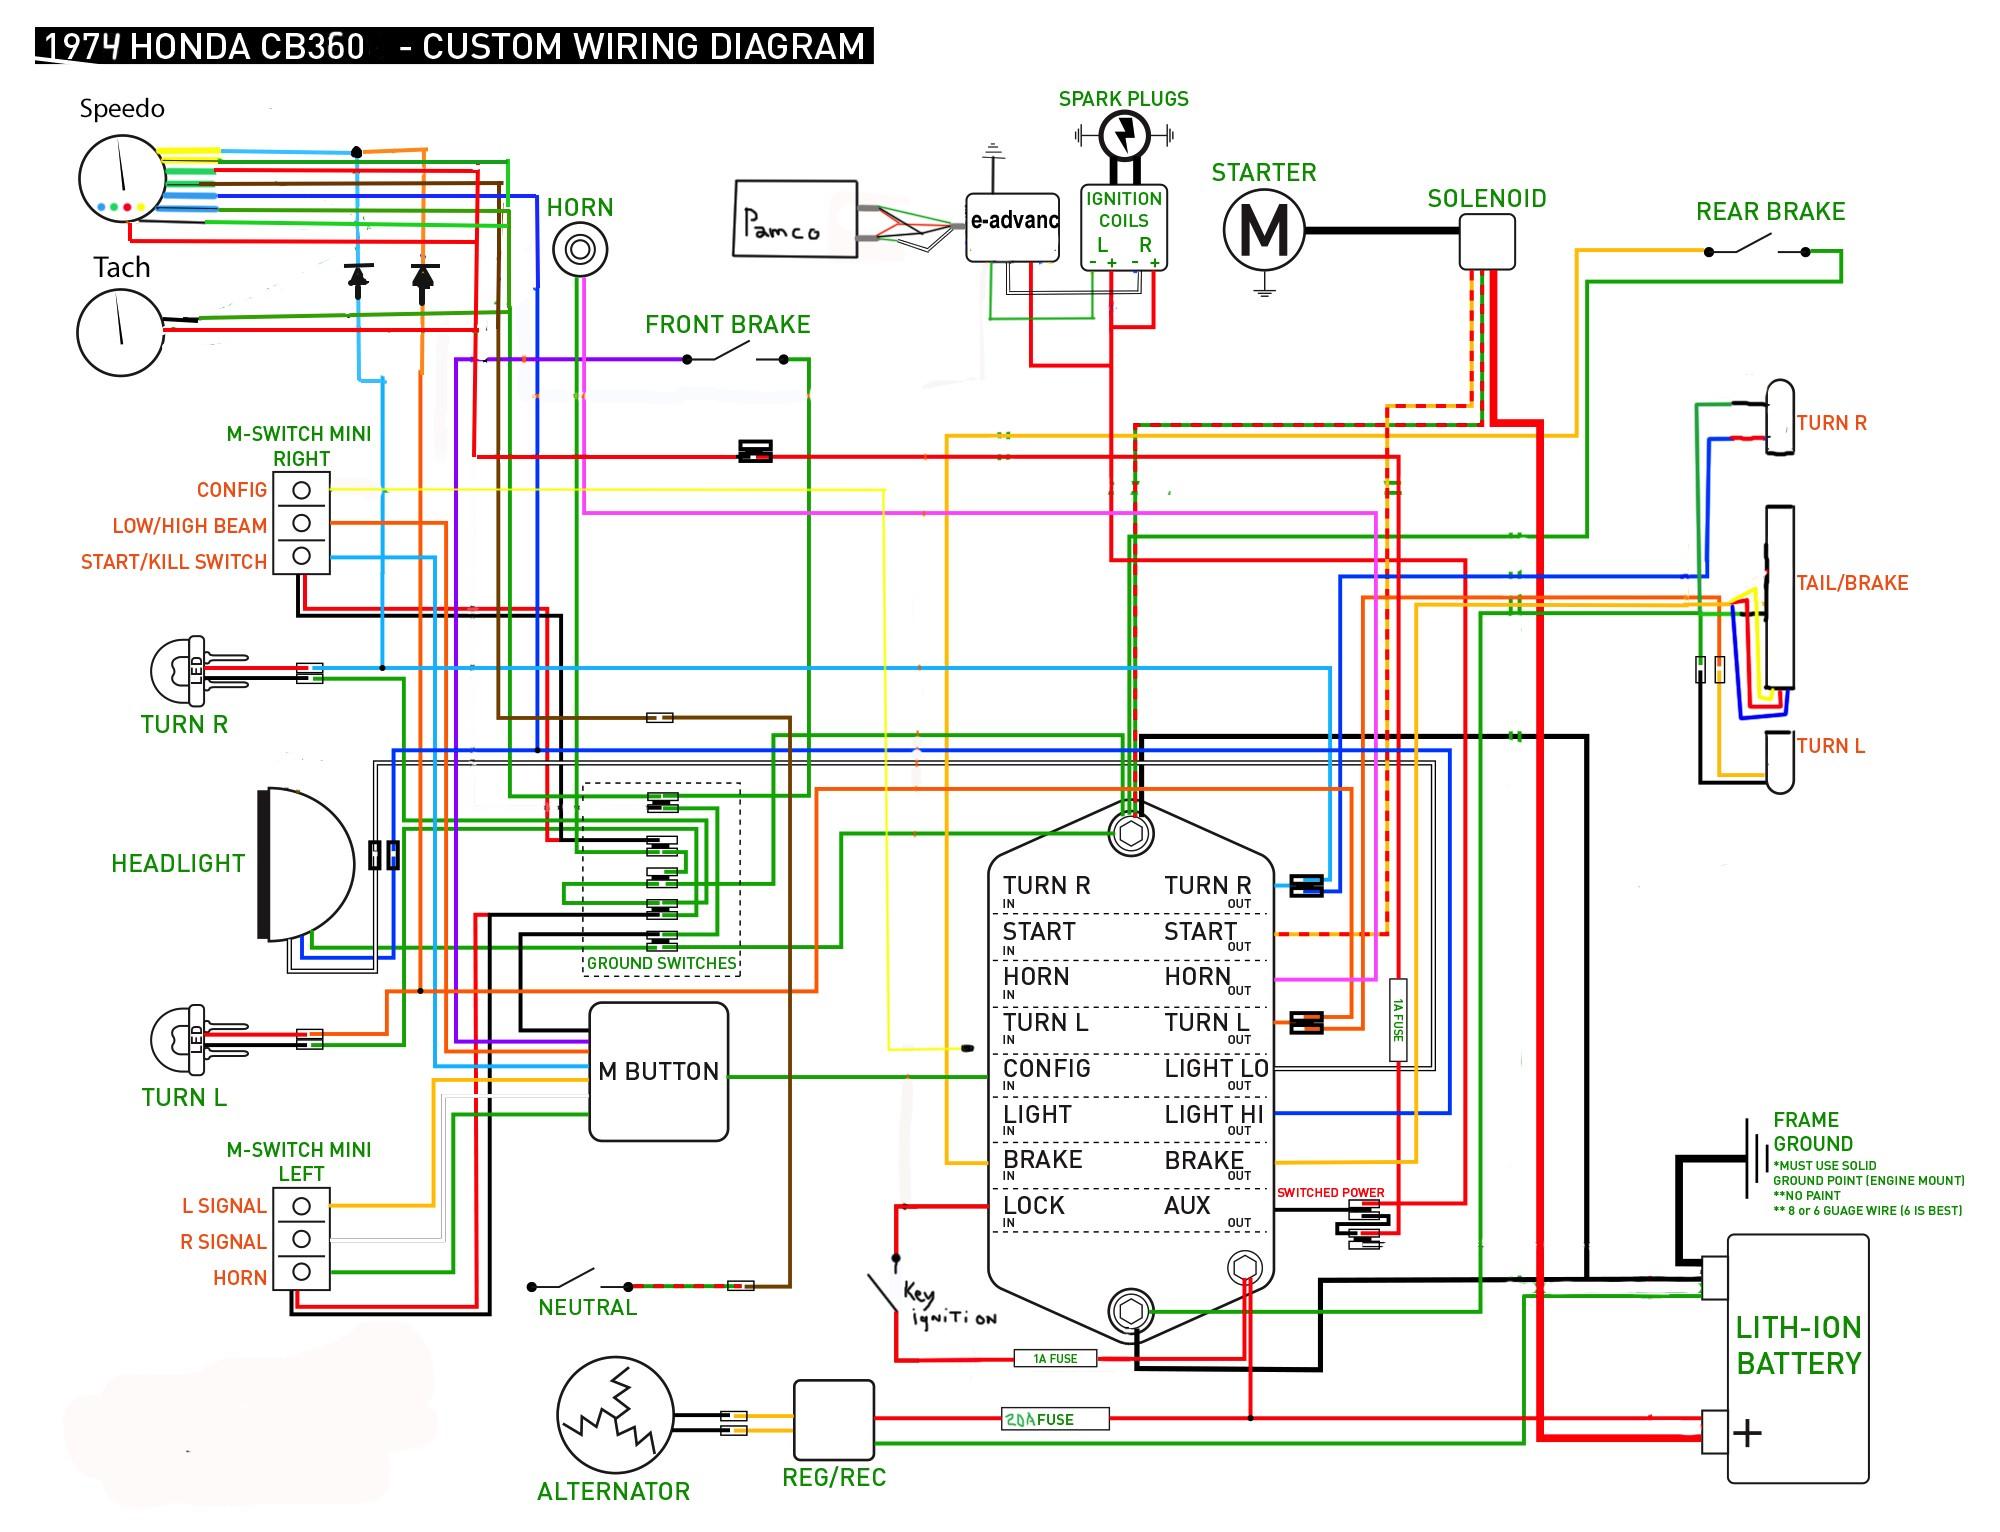 Viper 5301 Wiring Diagram 5902 350hv 5002 Remote Starter On